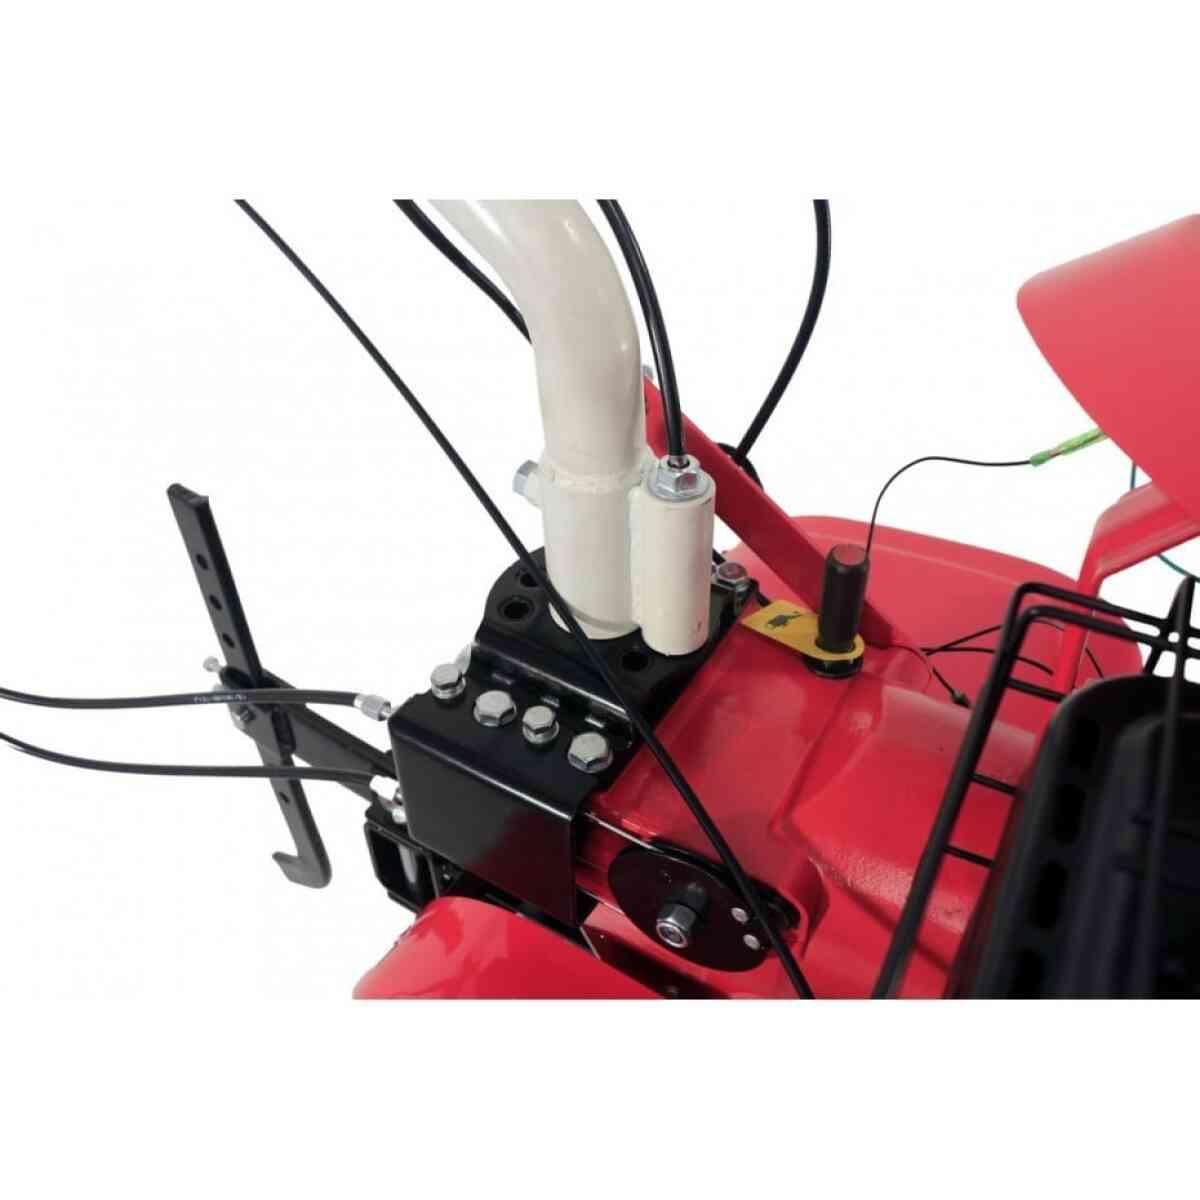 motocultor loncin lc1200 3plus1 o mac.ro 8 1 88